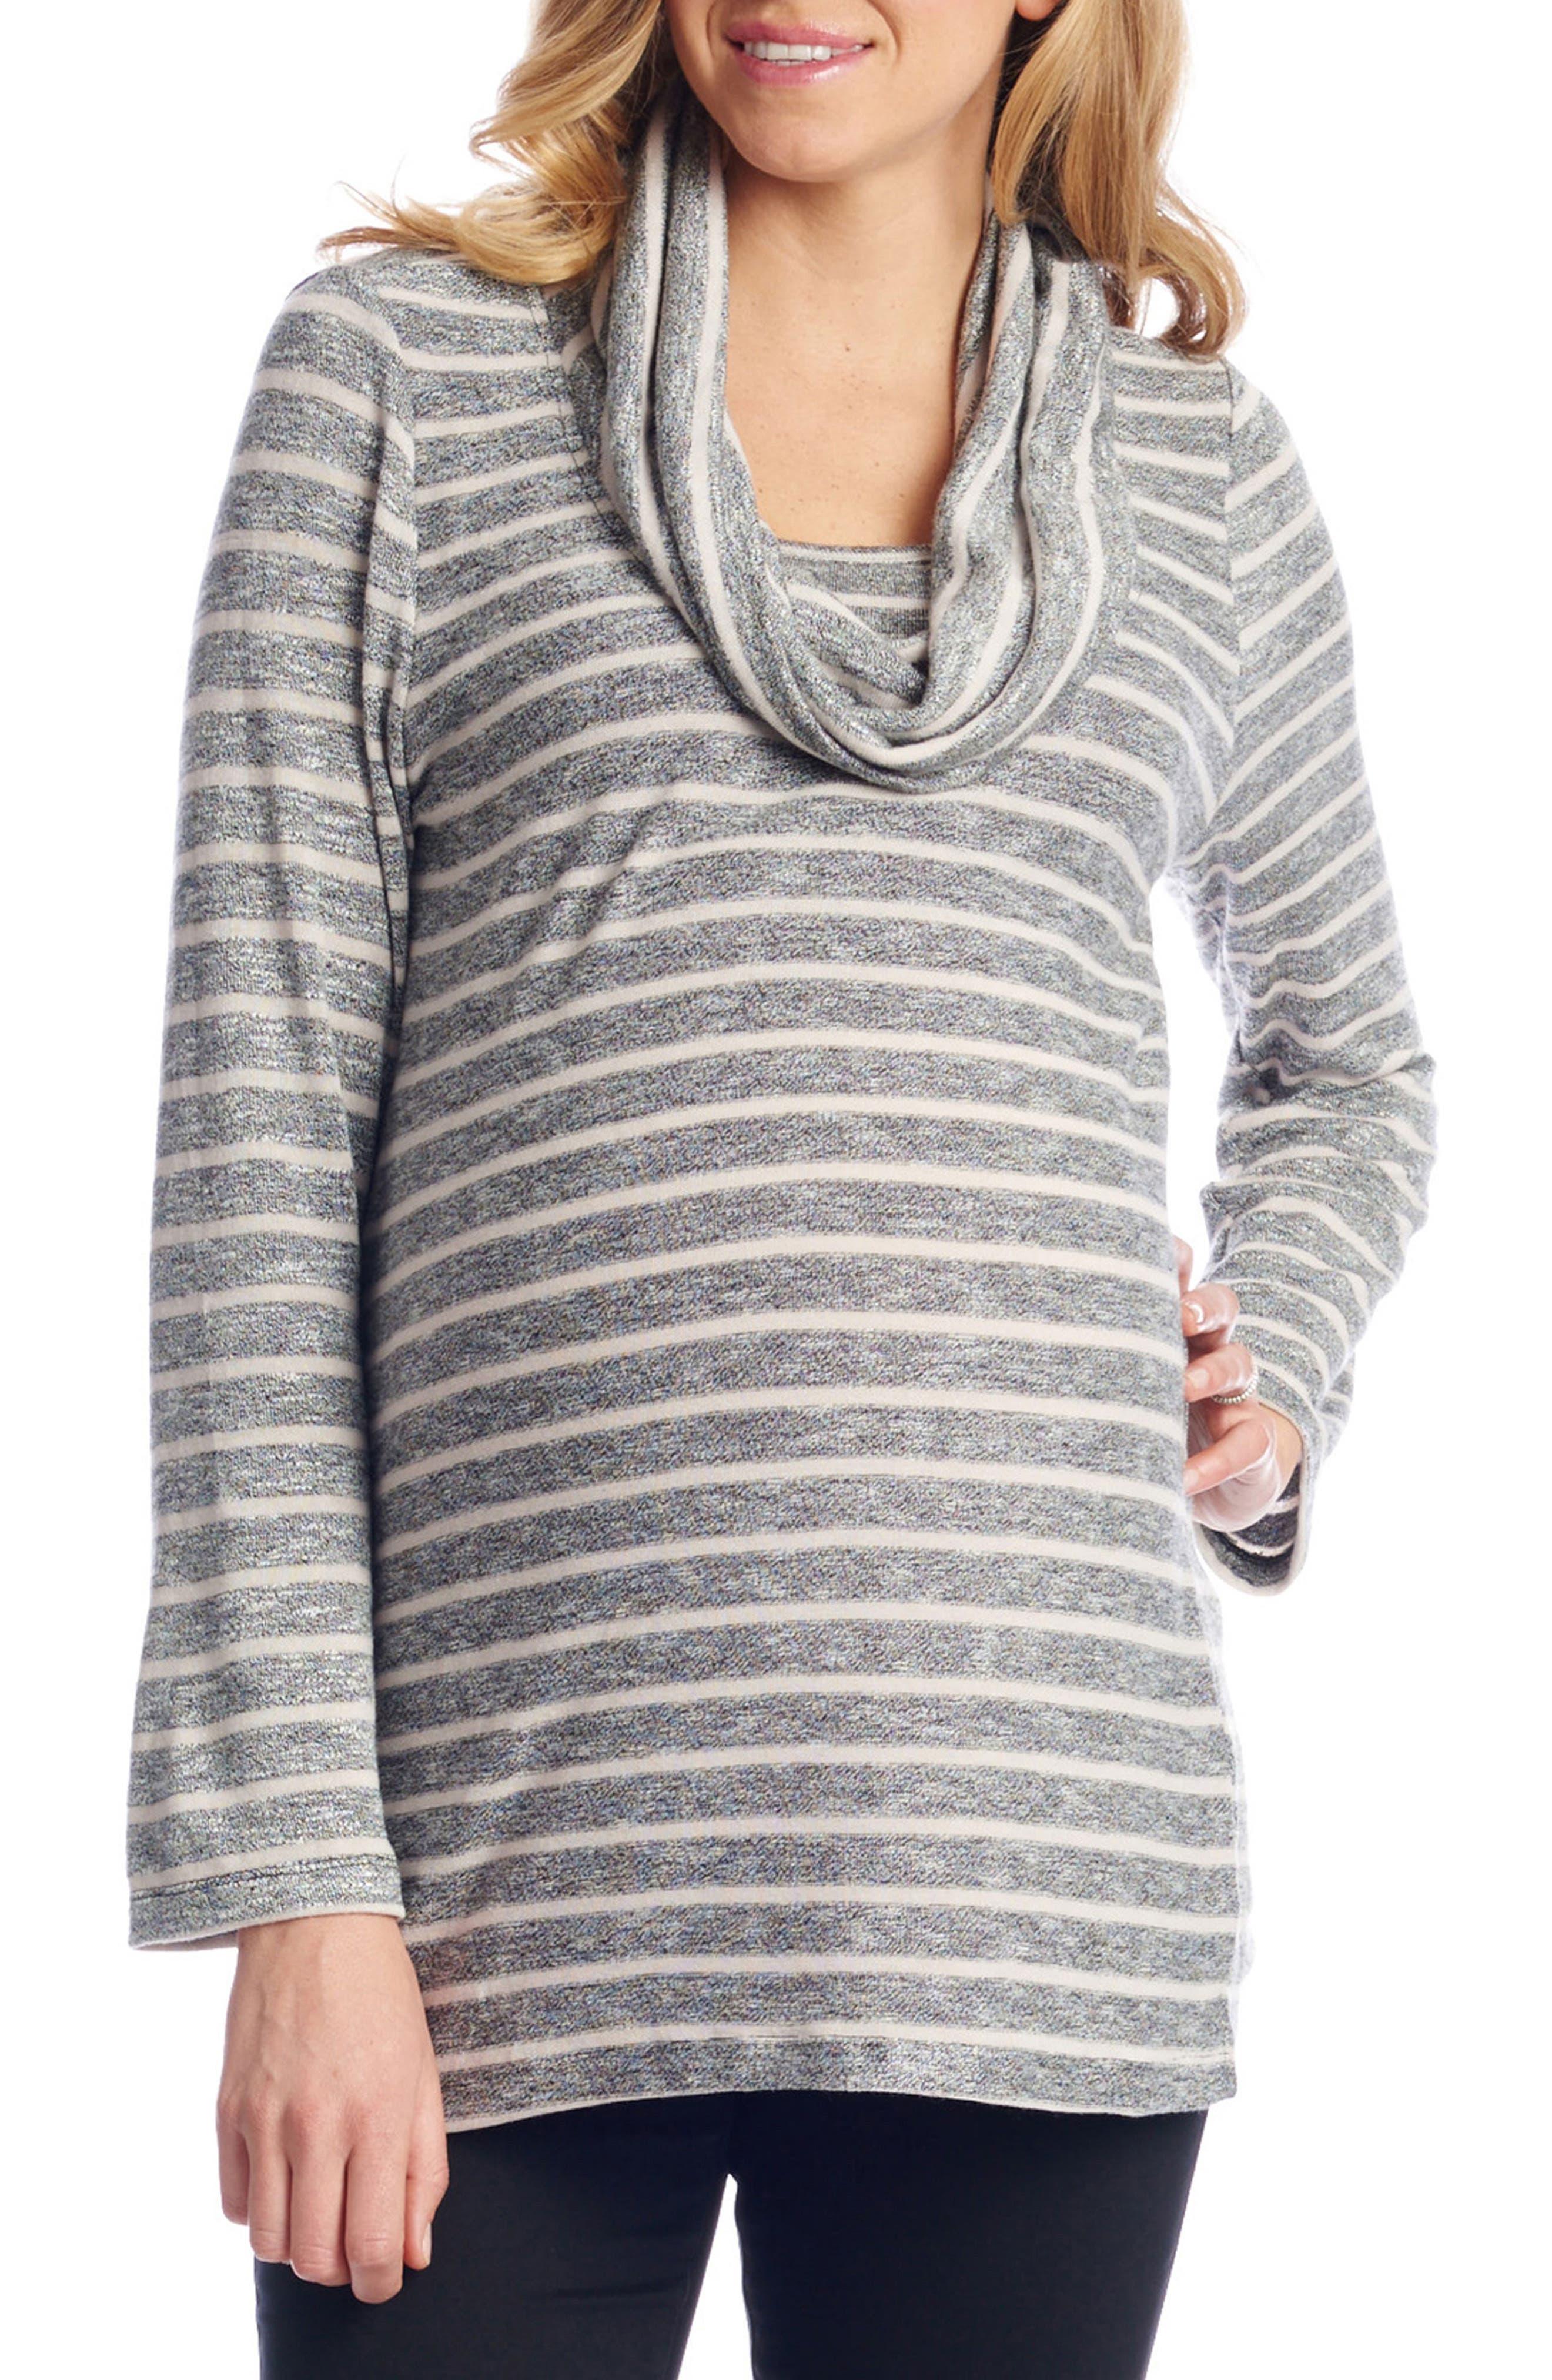 Everly Grey Reina Cowl Neck Maternity/Nursing Top